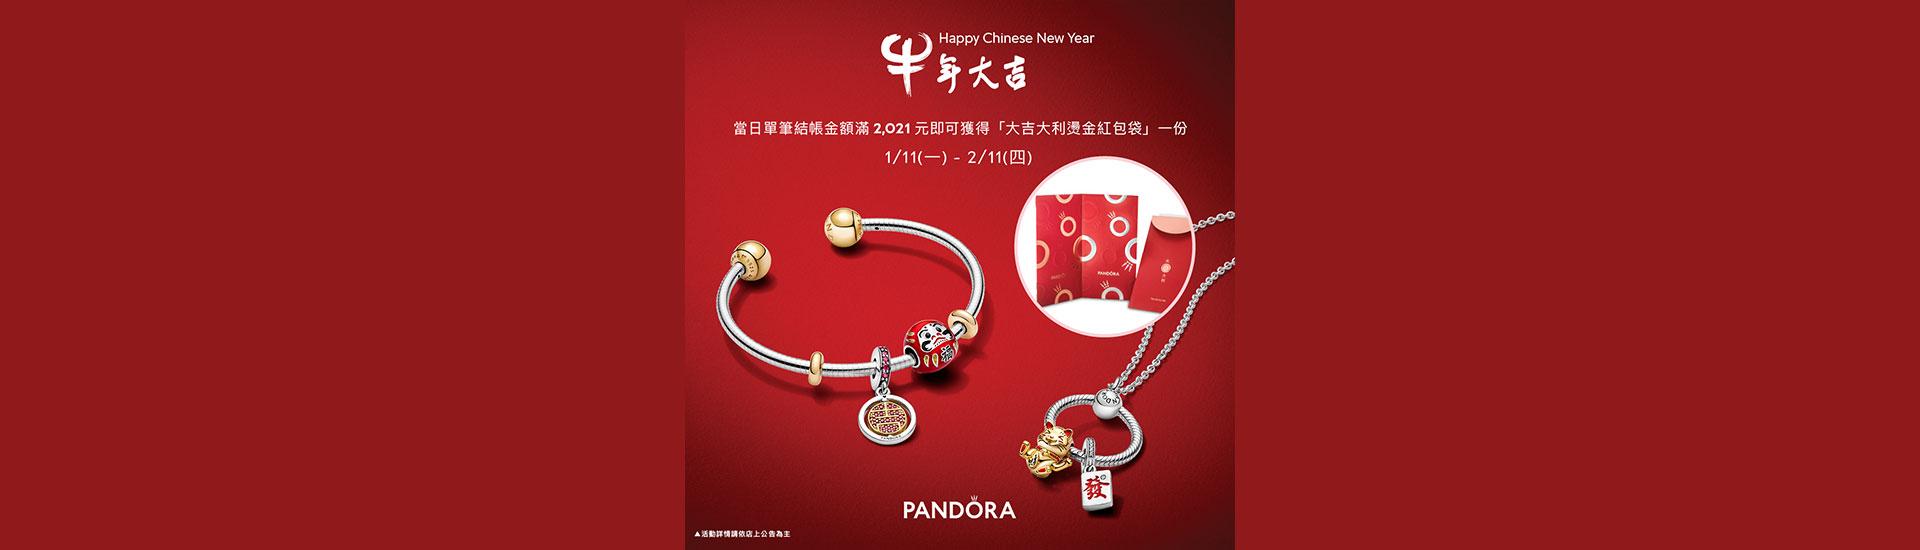 中壢店1F Pandora Happy Chinese New Year新品上市